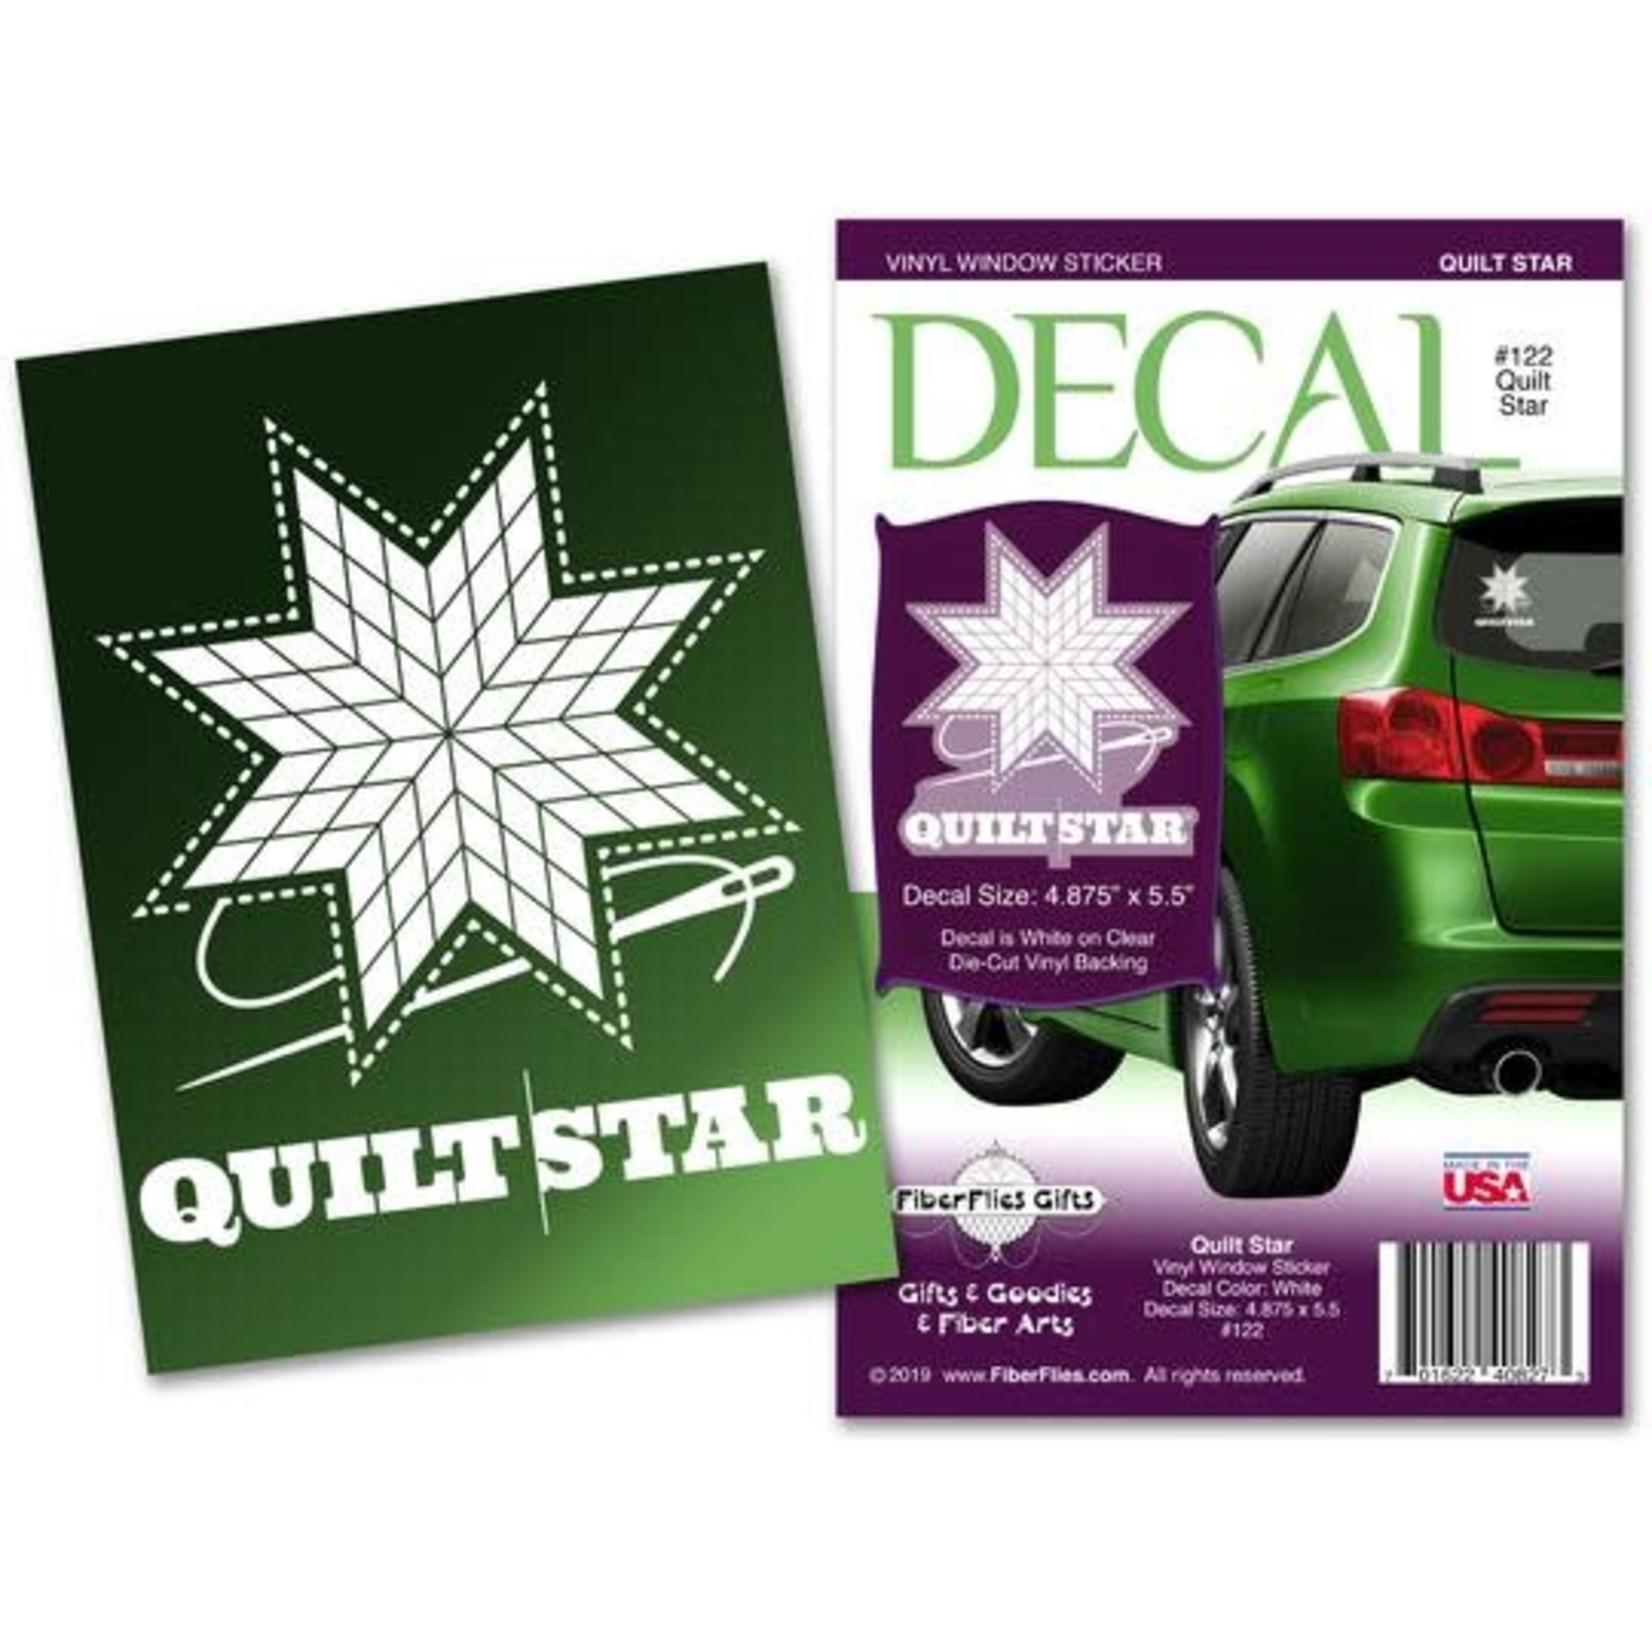 Fiber Flies Gifts Quilt Star - White - Vinyl Window Decal